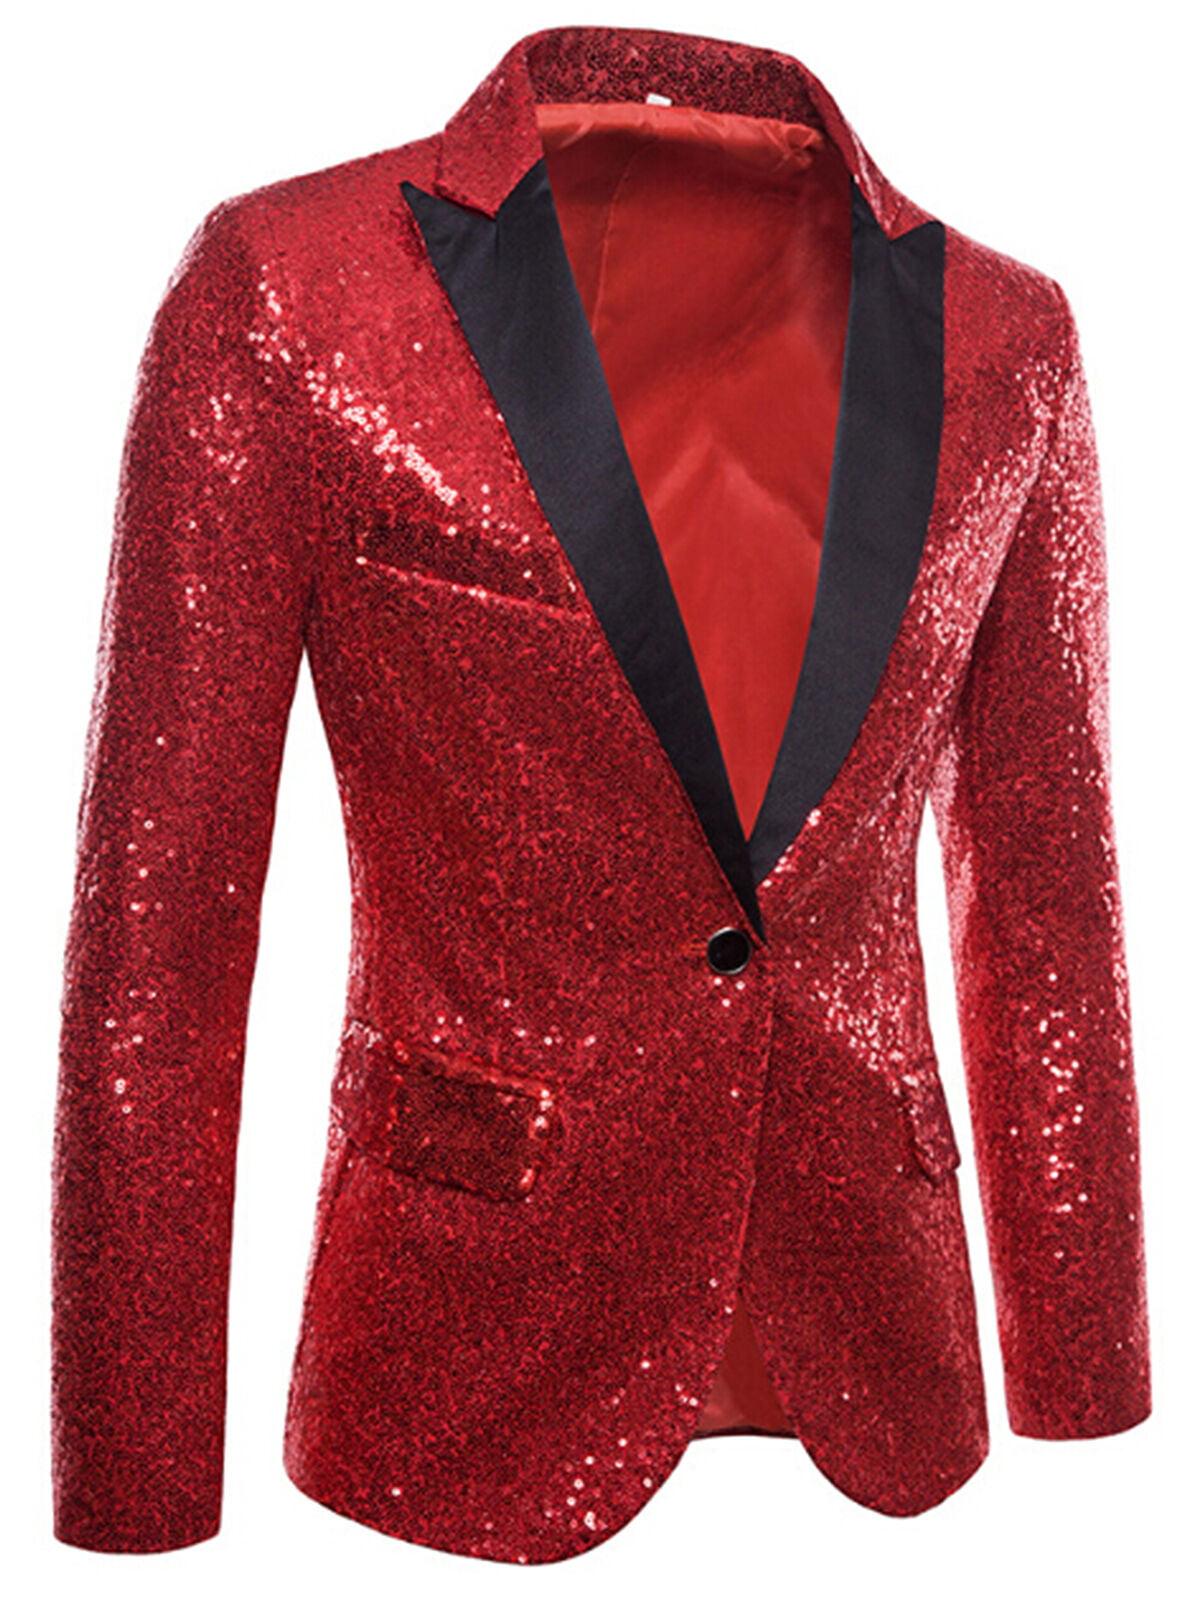 vastwit Kids Boys Shiny Sequins Suit Jacket Blazer One Button Tuxedo for Wedding Party Banquet Prom